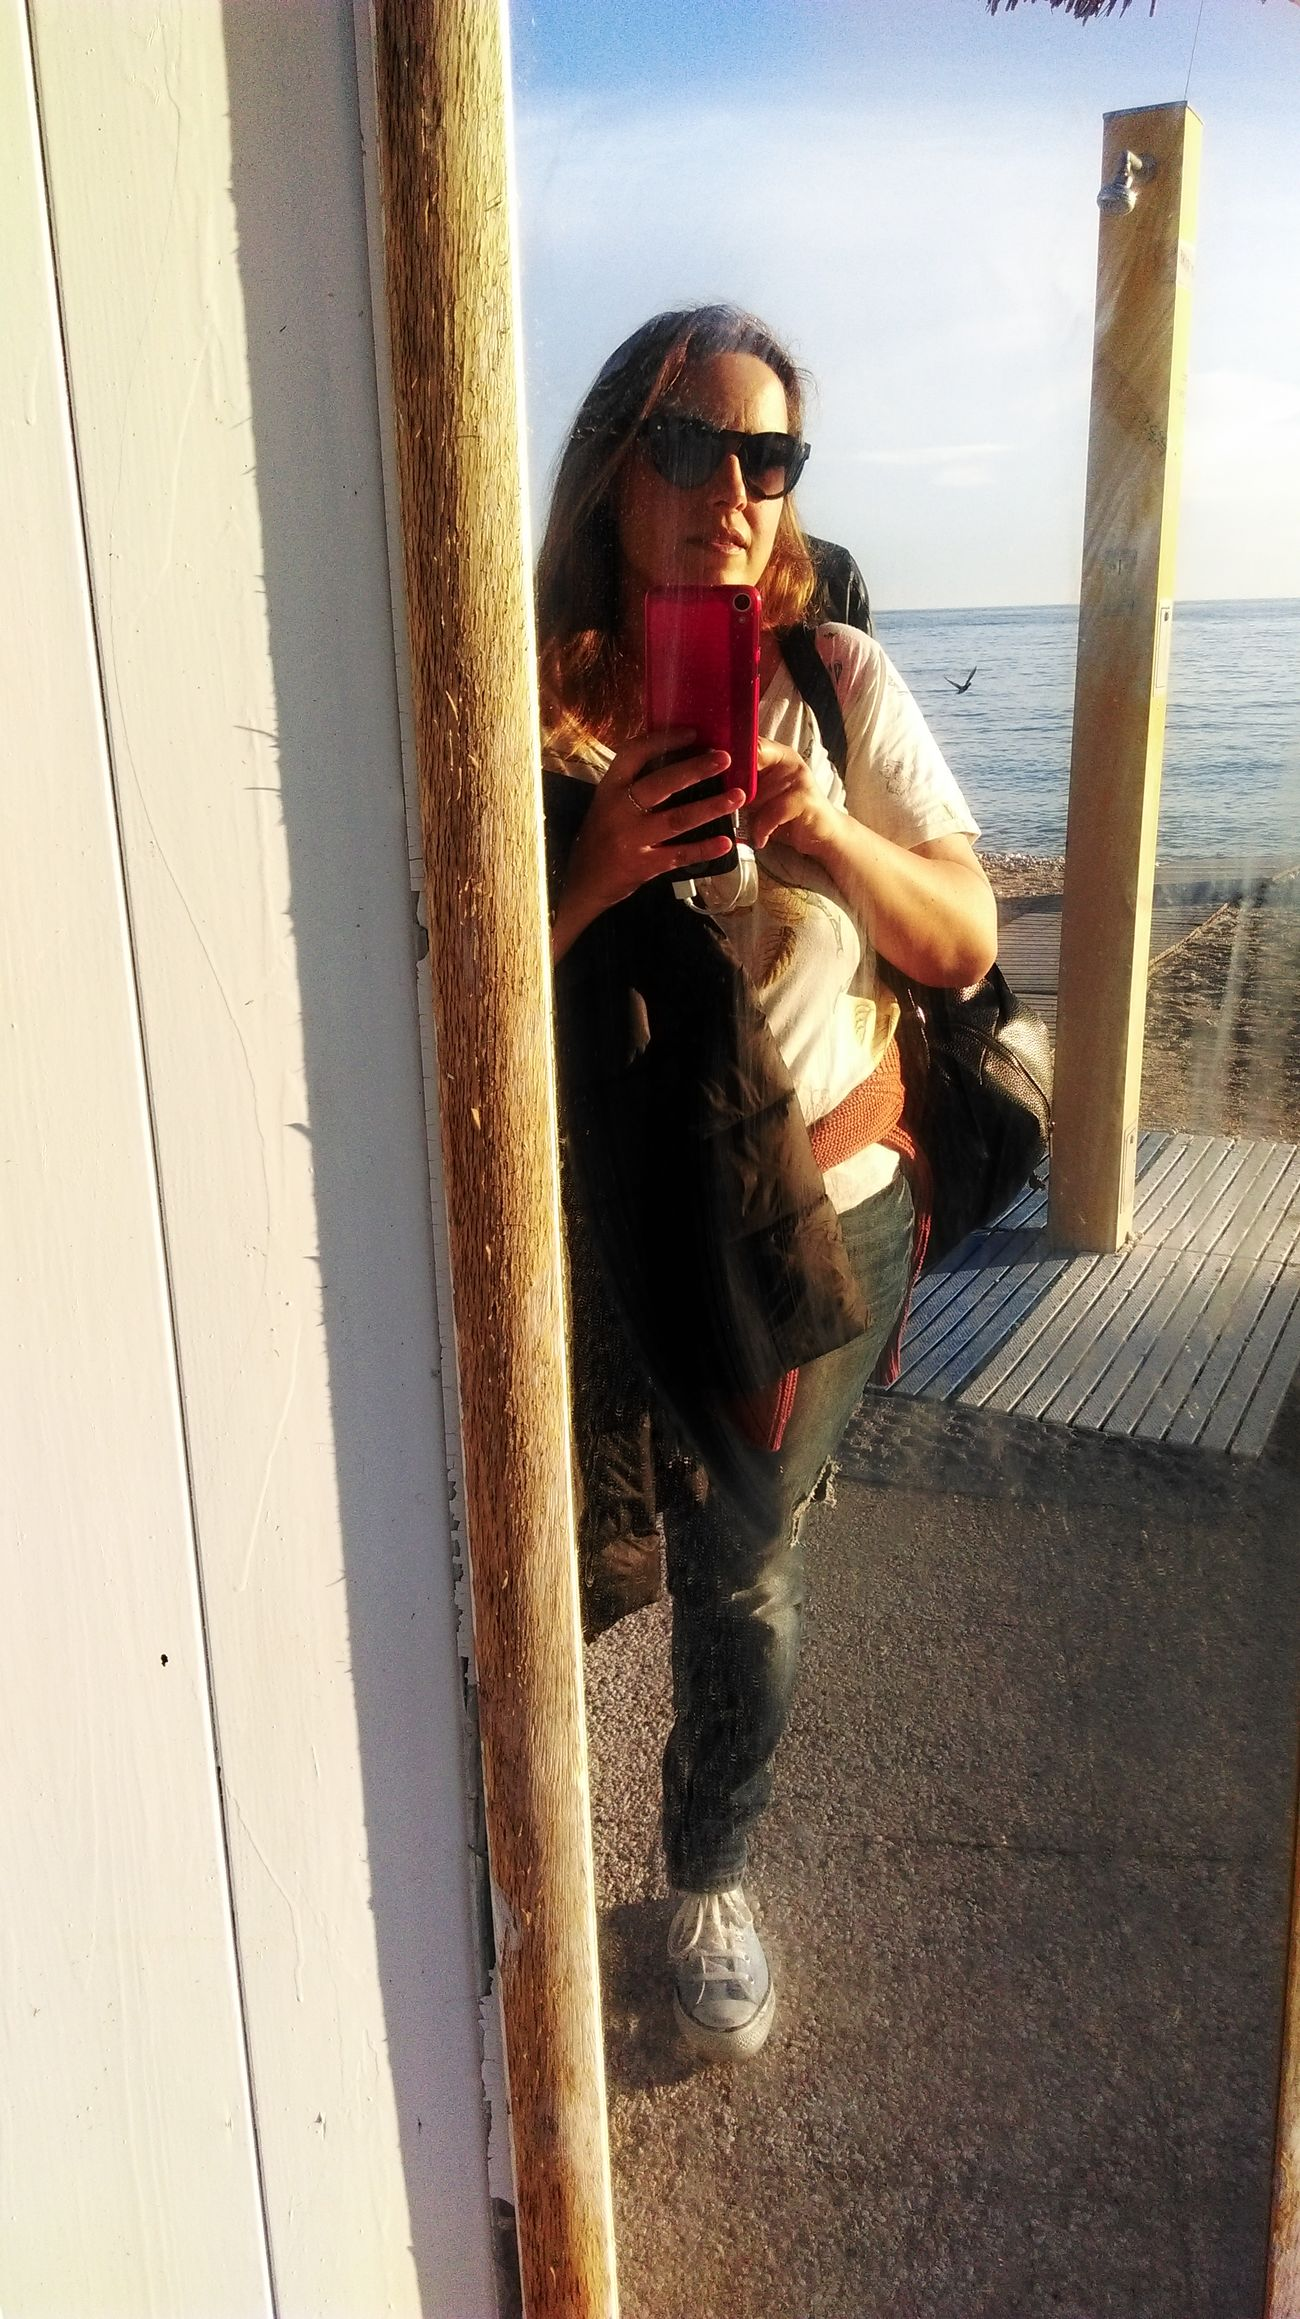 Sunglasses Water Sea Beach Silhouette Vacations Life Is A Beach Travel Destinations Tranquility Relaxing Beauty In Nature Beautiful Lifestyles Relax My Point Of View Sky No Filter Conero Portonovo, Italy Baia Di Portonovo (an) Monteconero Portonovo Sun Reflection Outdoors